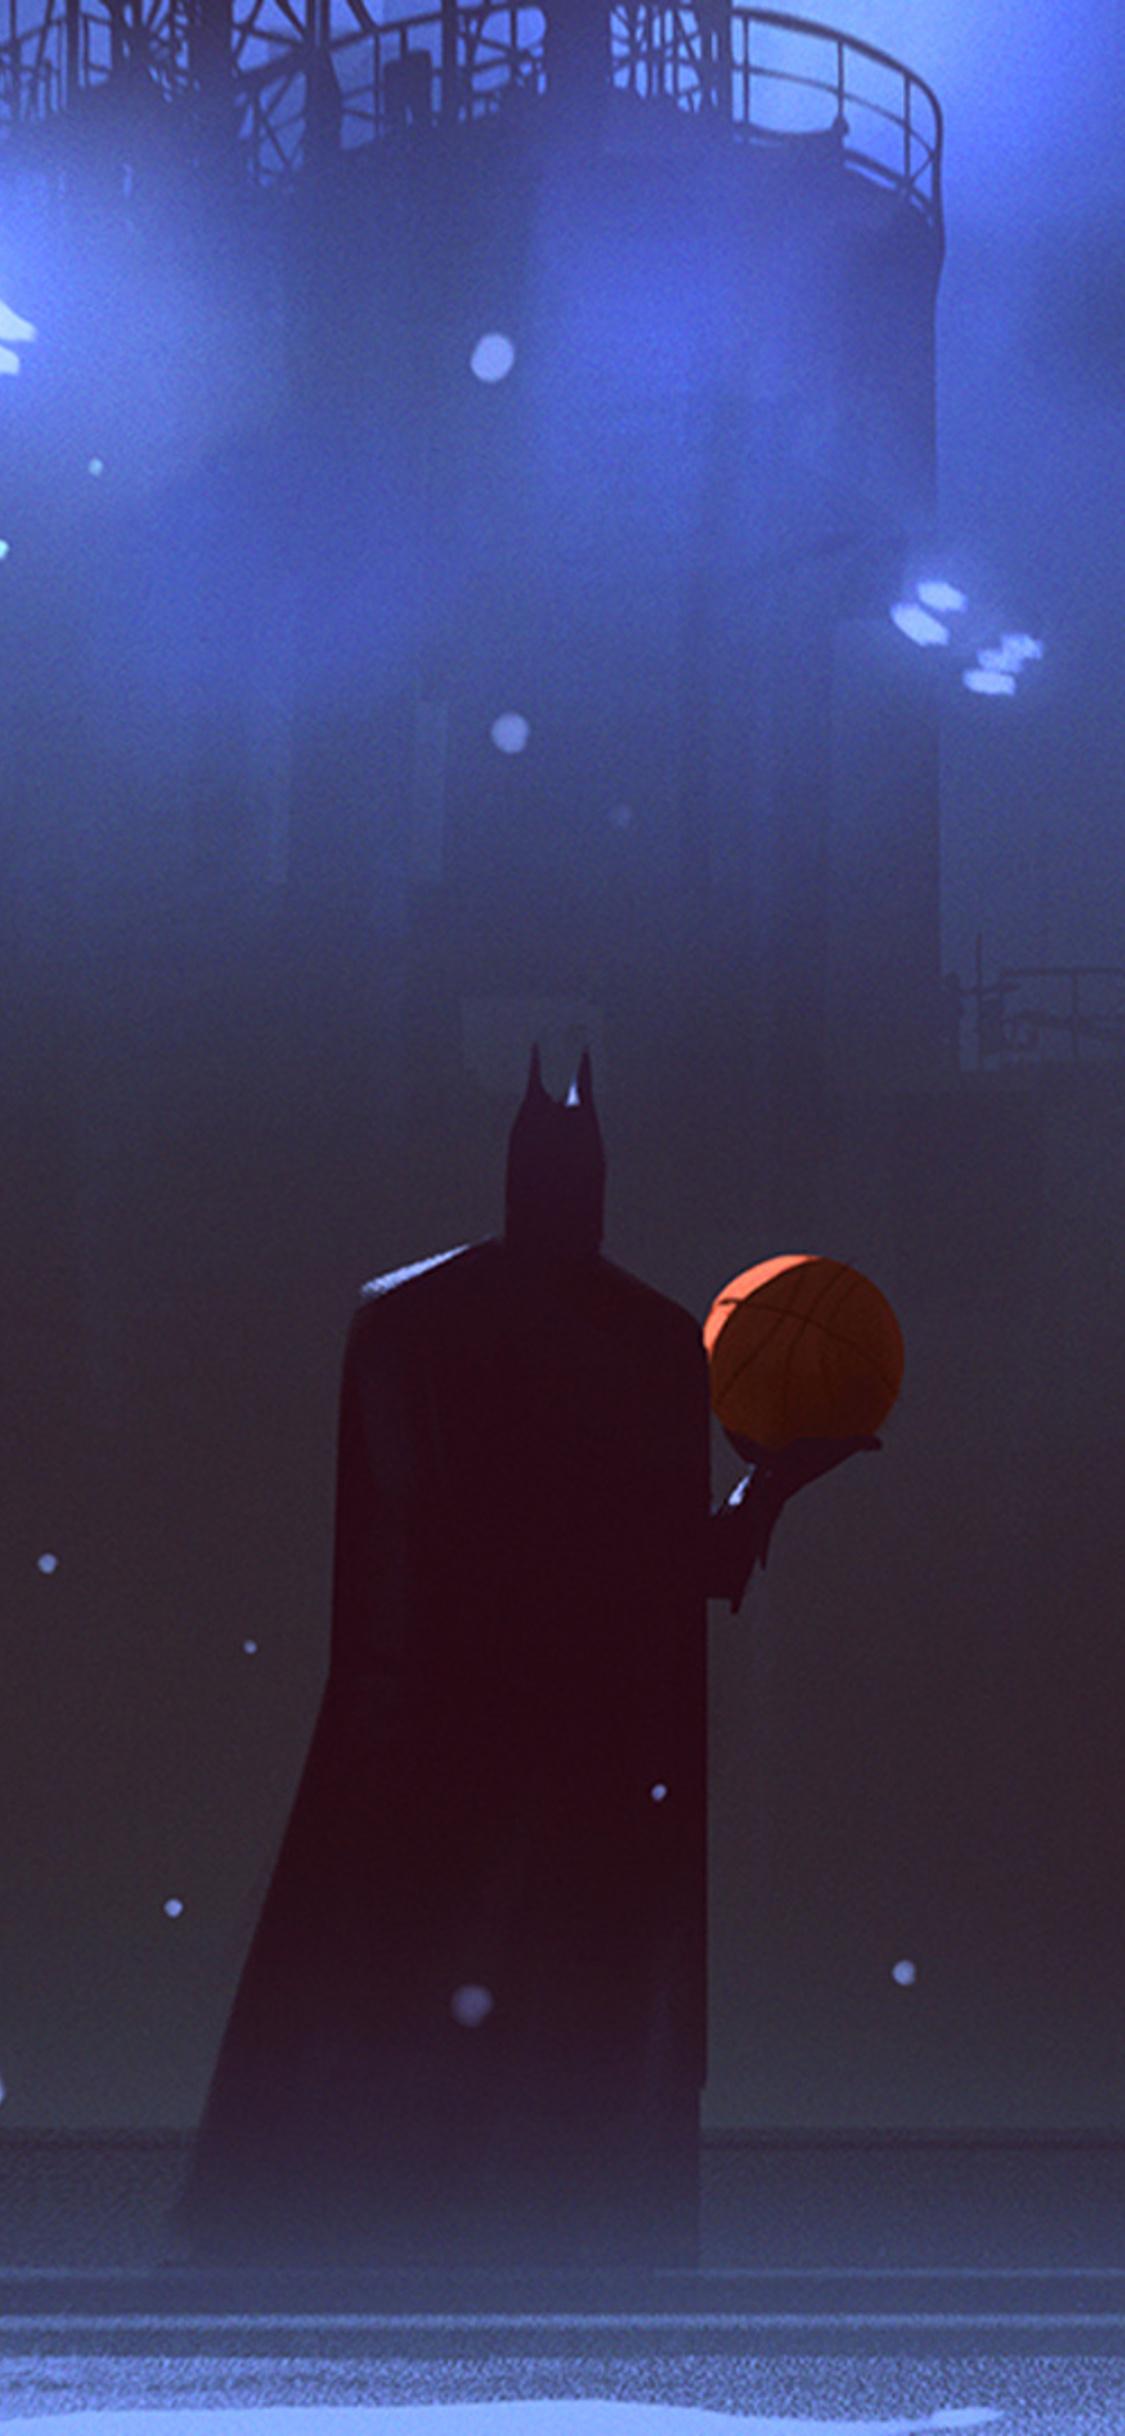 1125x2436 Batman Playing Basketball Iphone Xs Iphone 10